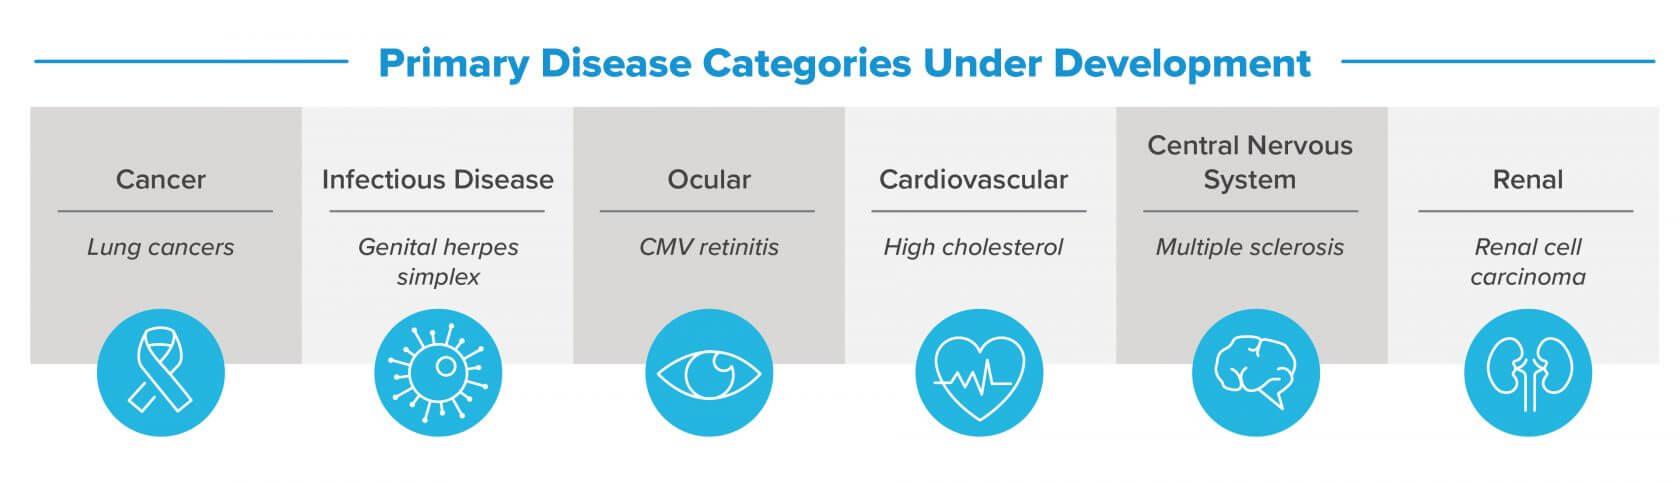 oligonucleotide targeting diseases